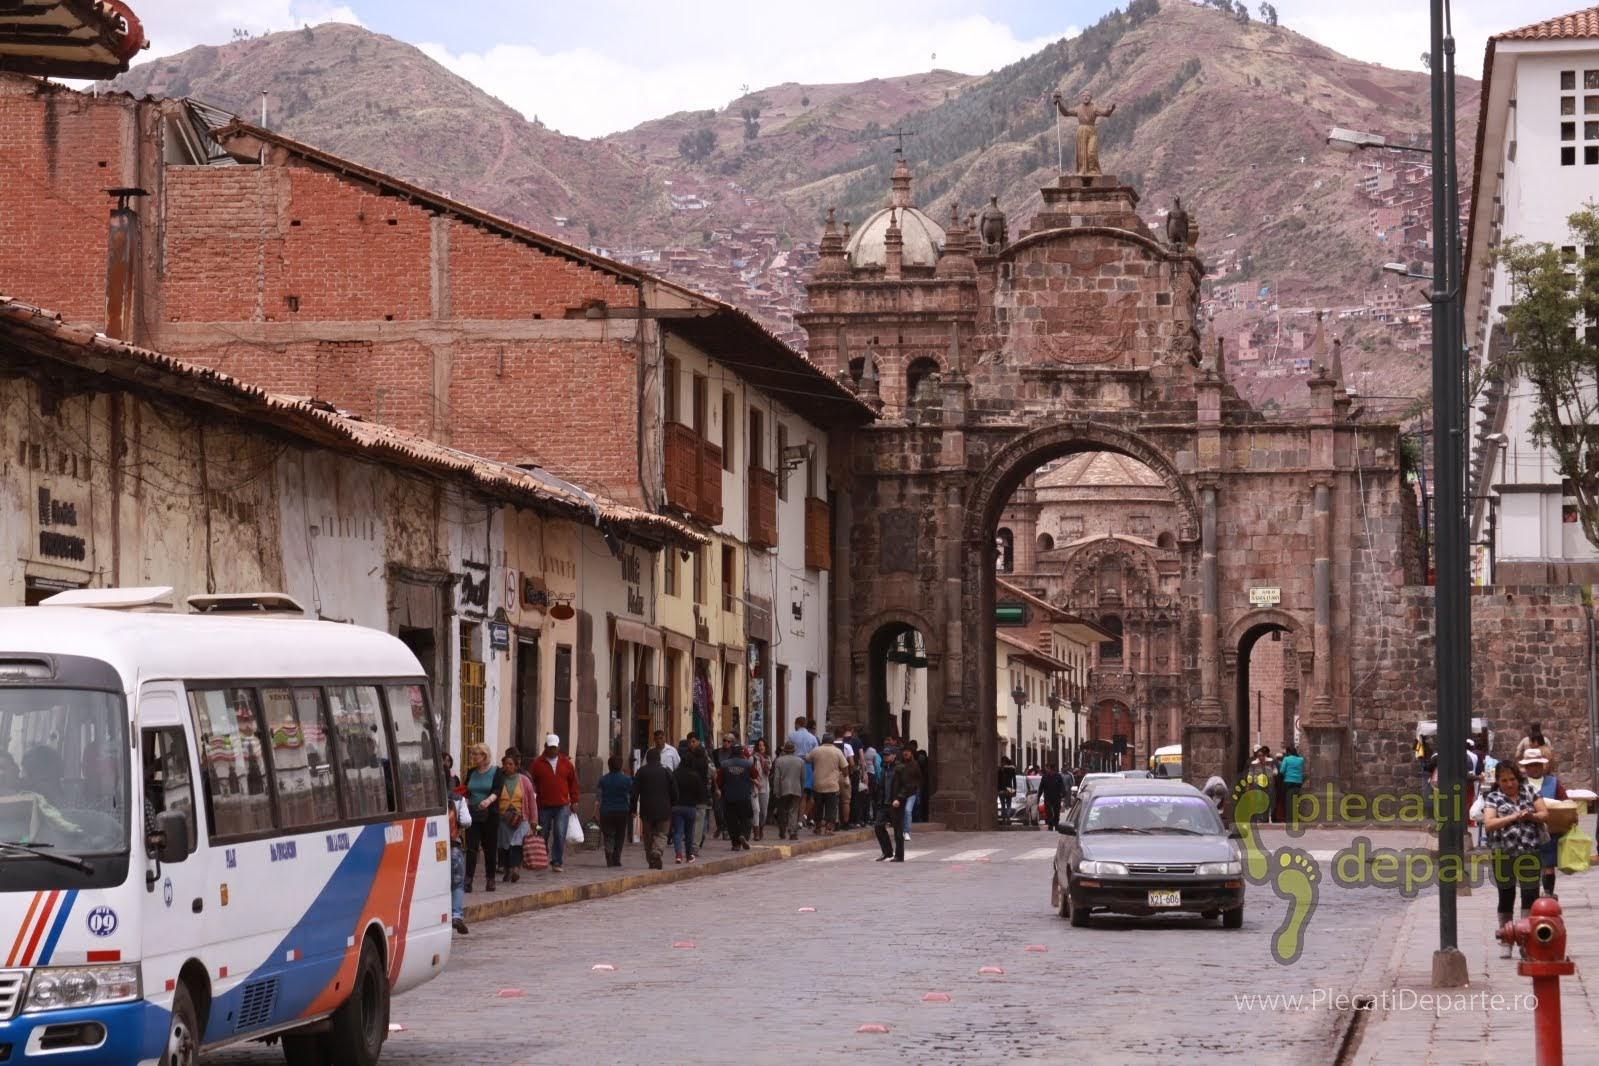 Plaza San Francisco spre Mercado San Pedro, in Cusco, Peru